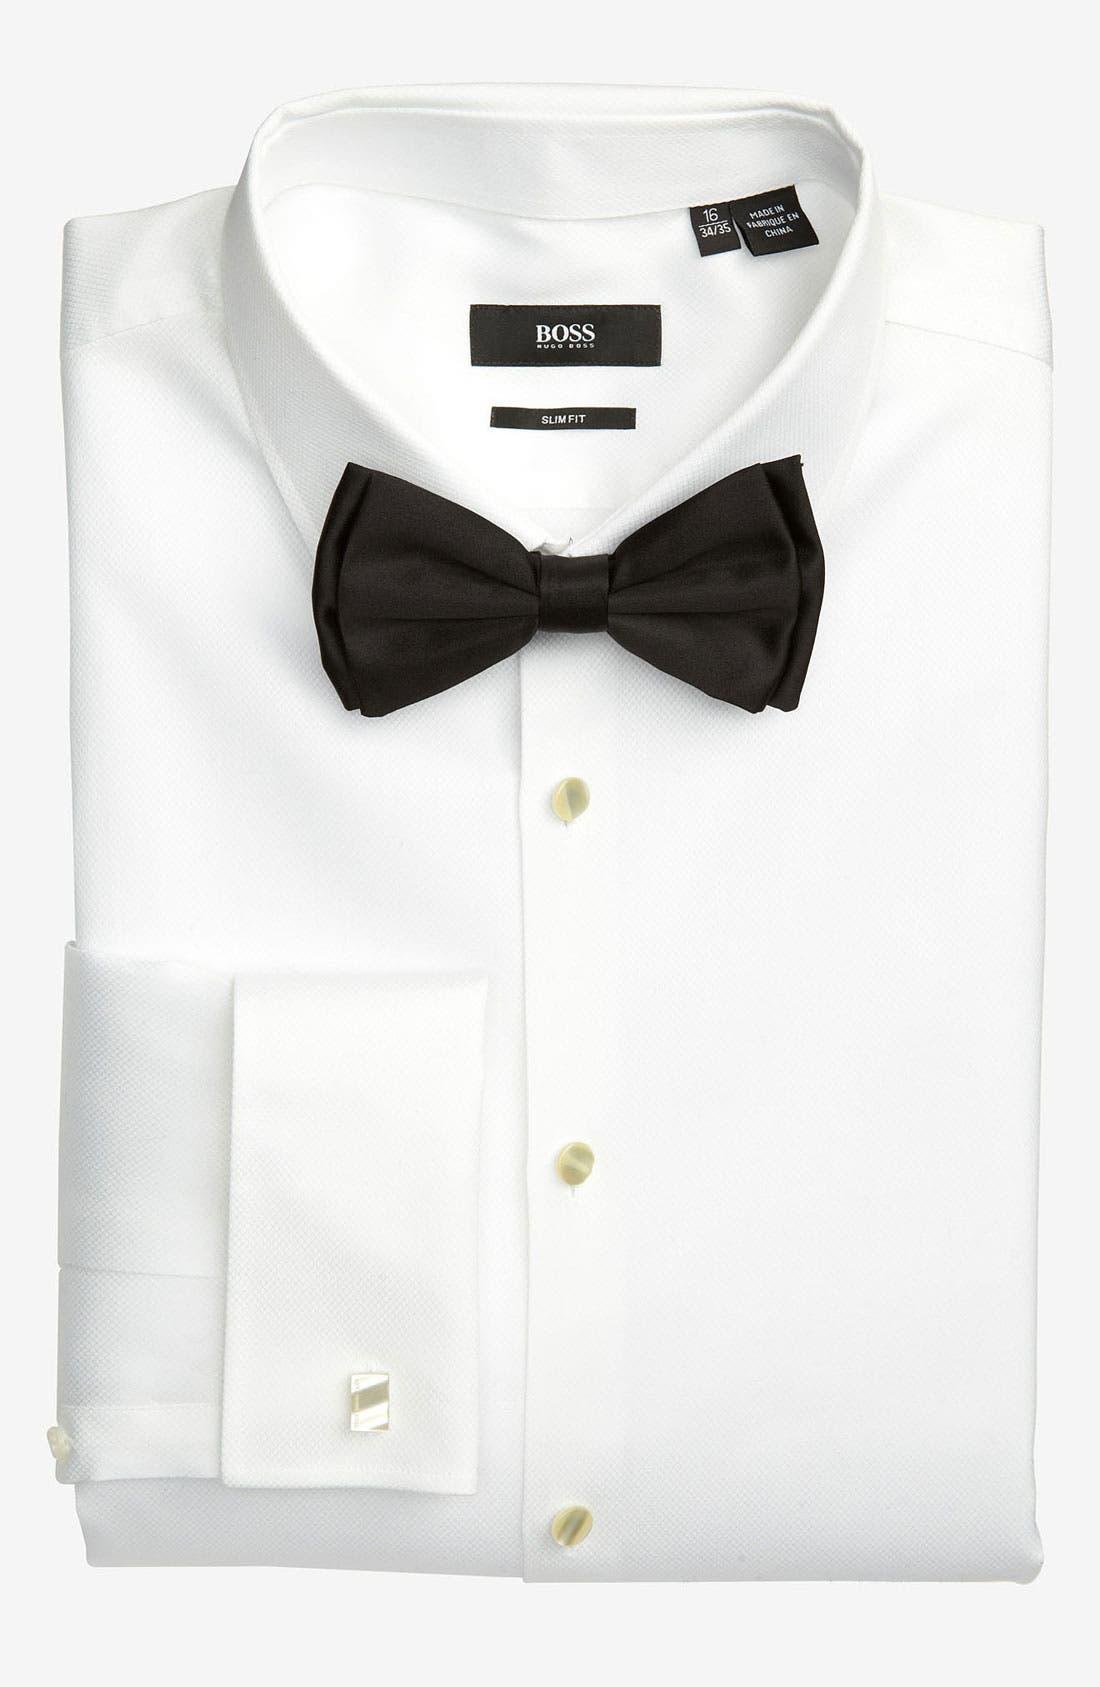 BOSS, Jameson Slim Fit Diamond Weave French Cuff Tuxedo Shirt, Alternate thumbnail 5, color, 120